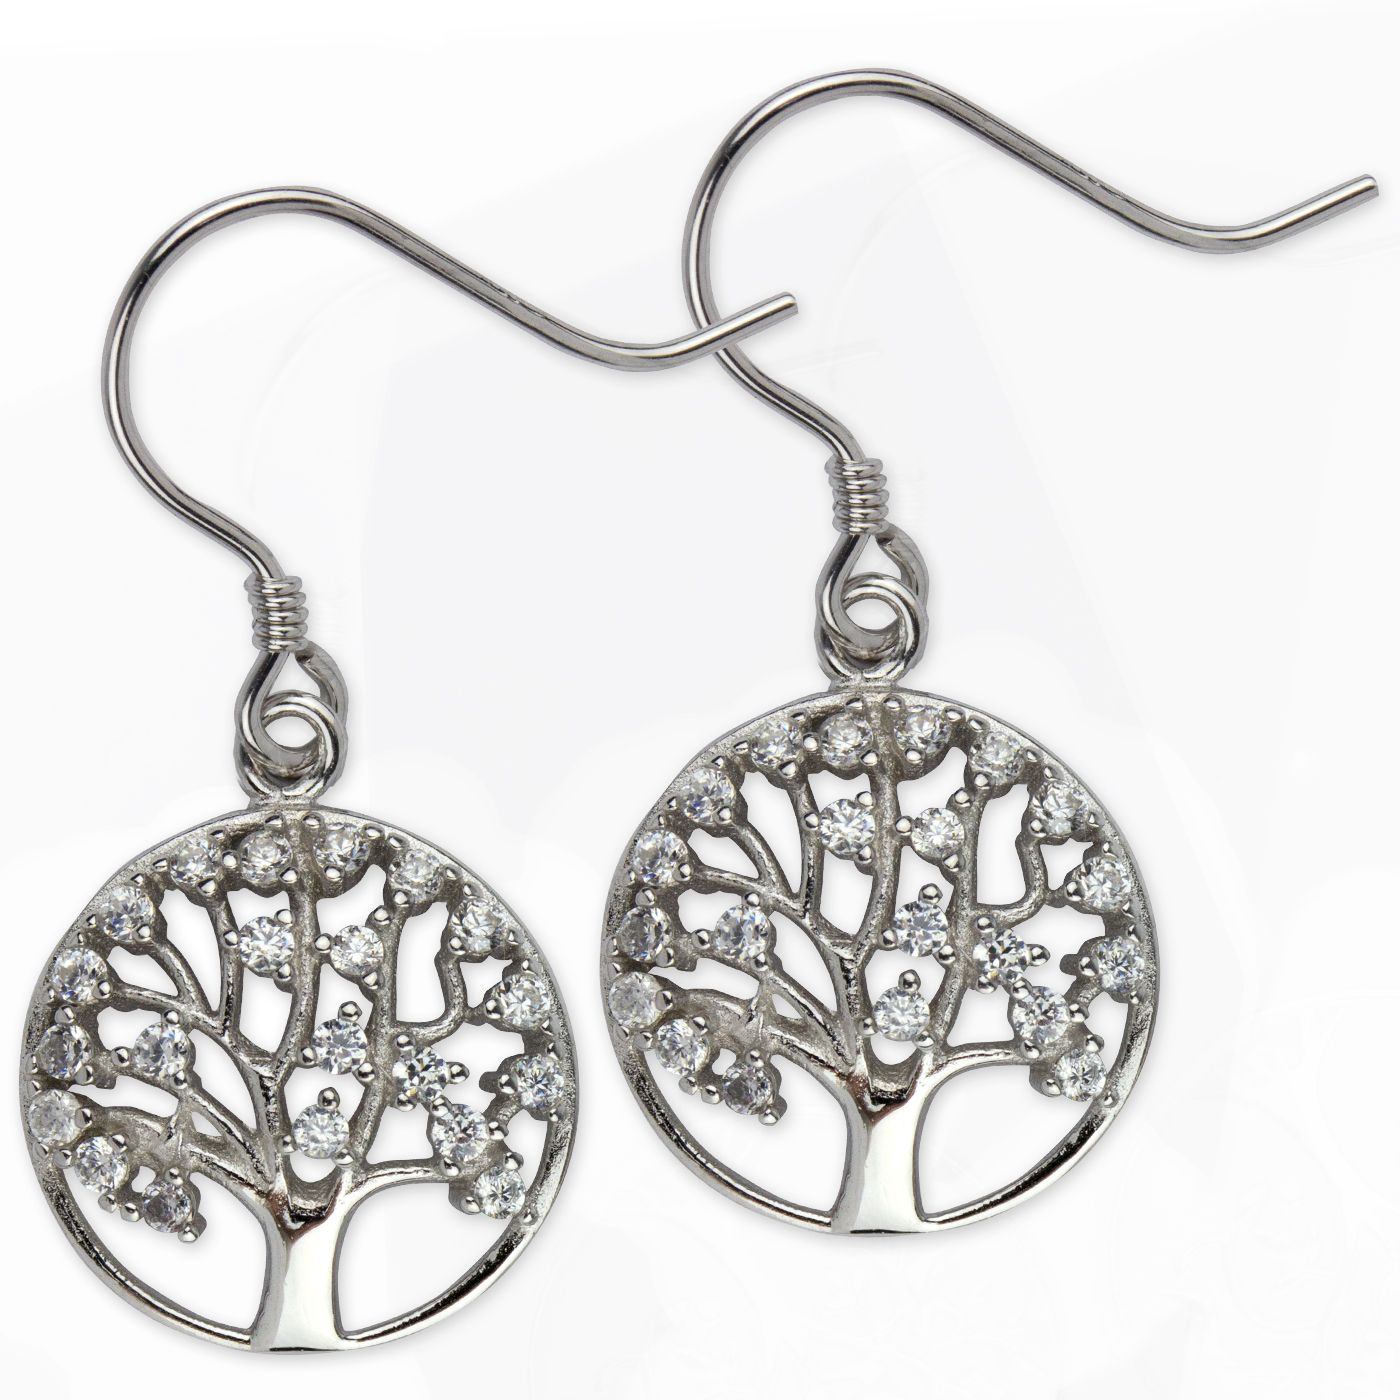 1 Paar Ohrhänger Ohrringe Baum Des Lebens Lebensbaum Aus 925er Indianerschmuck Folkloreschmuck